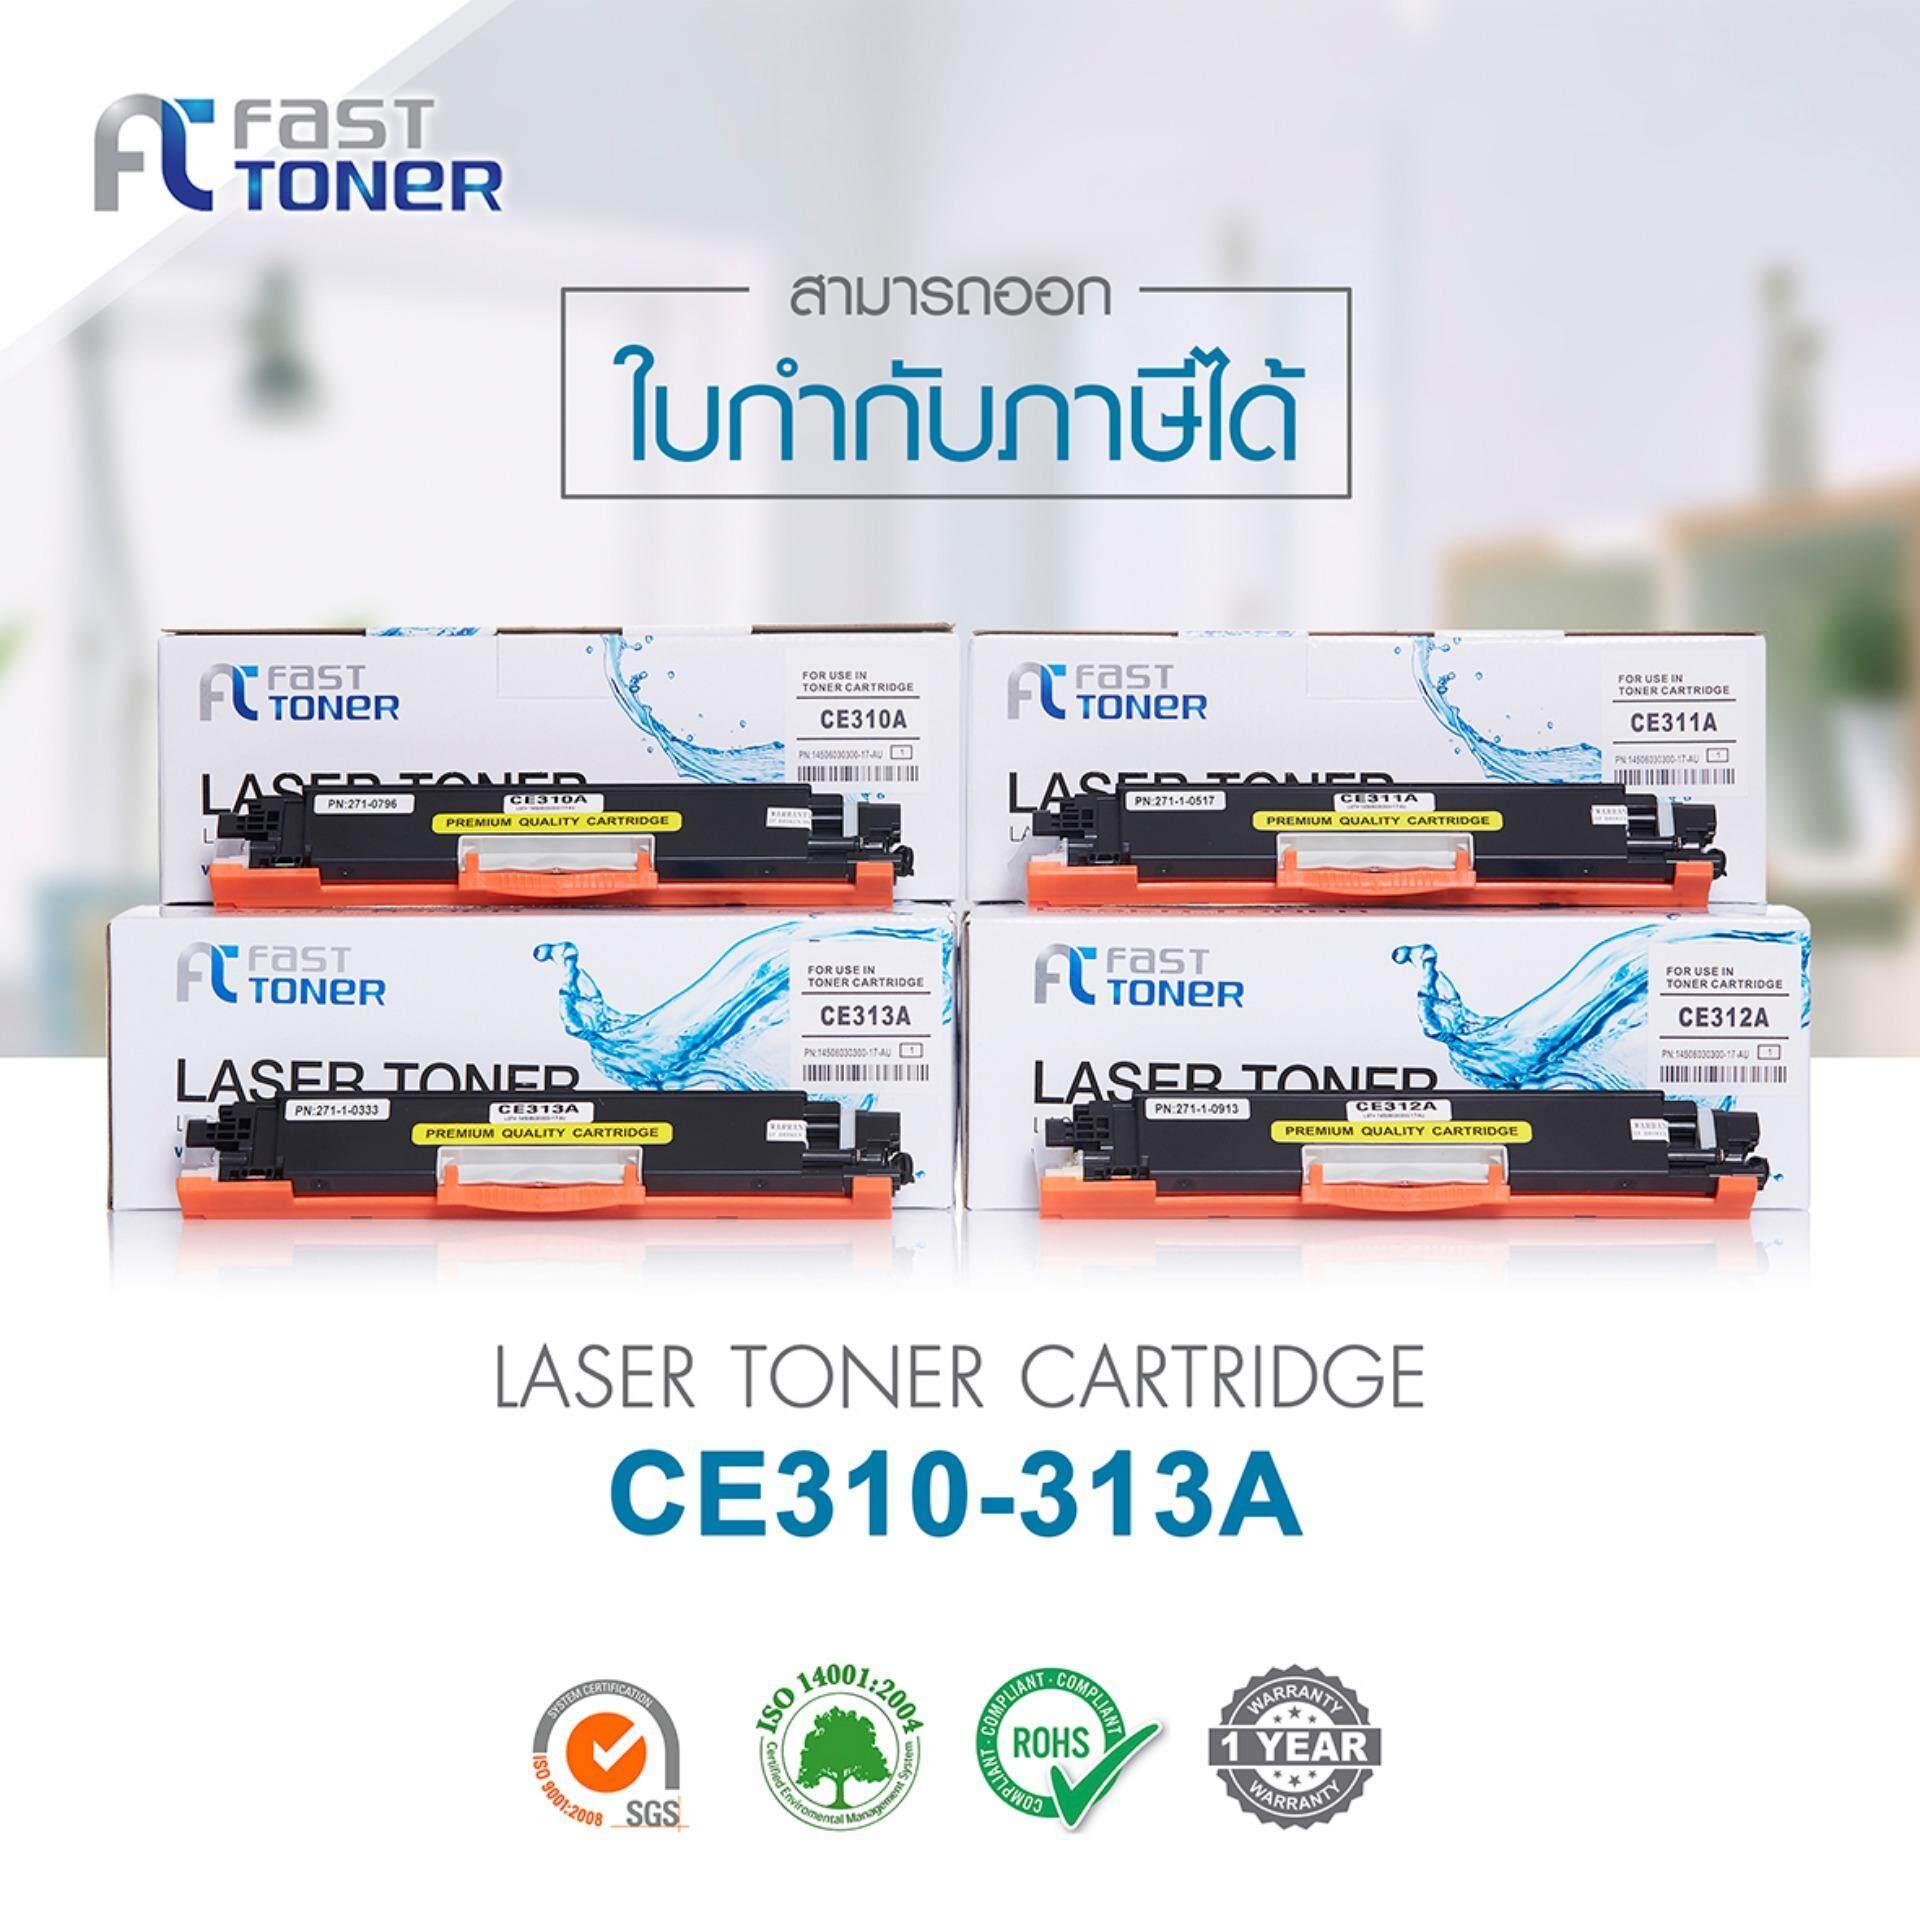 HP Fast Toner 126A-CE310A-CE313A Set